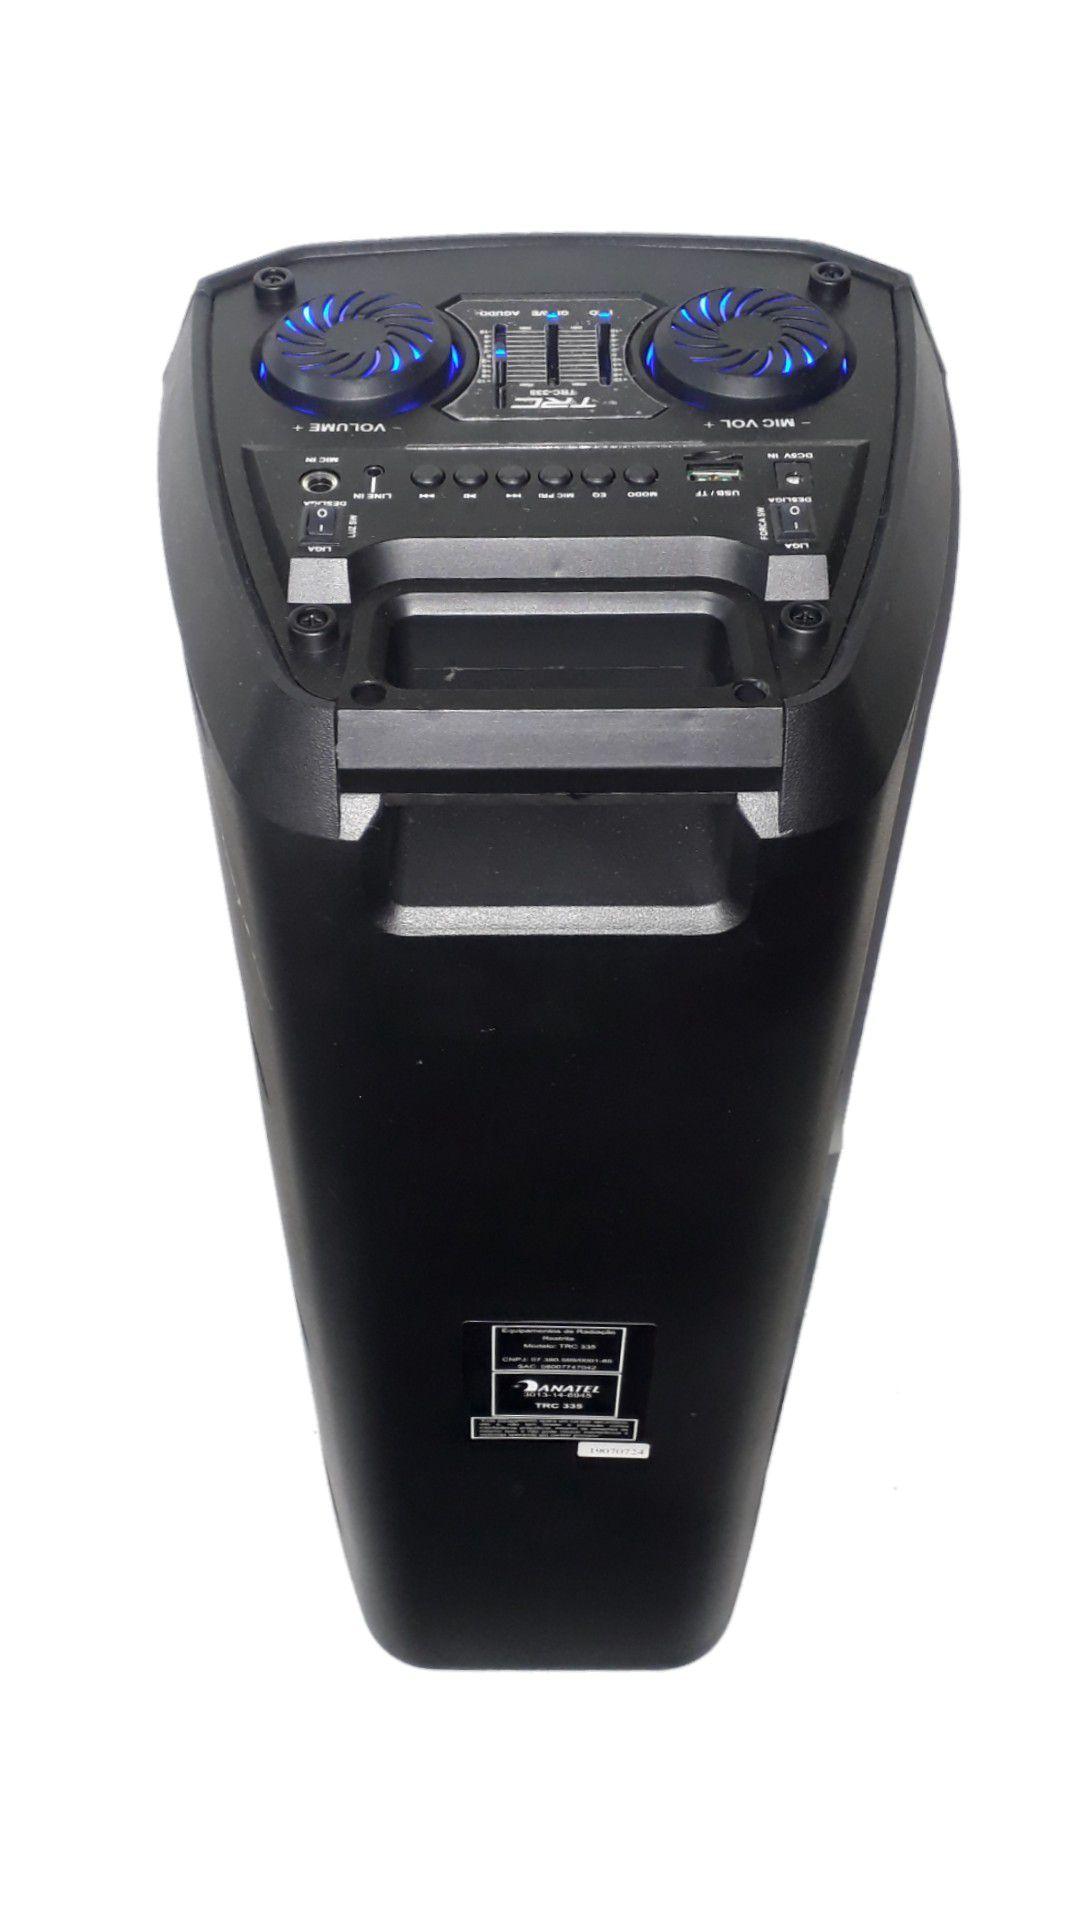 CAIXA AMPLIFICADA TRC 335 2FAL6 USB/SD/BLUE/FM 1MICROFONE C/FIO, CONTROLE REMOTO, BATERIA 200W